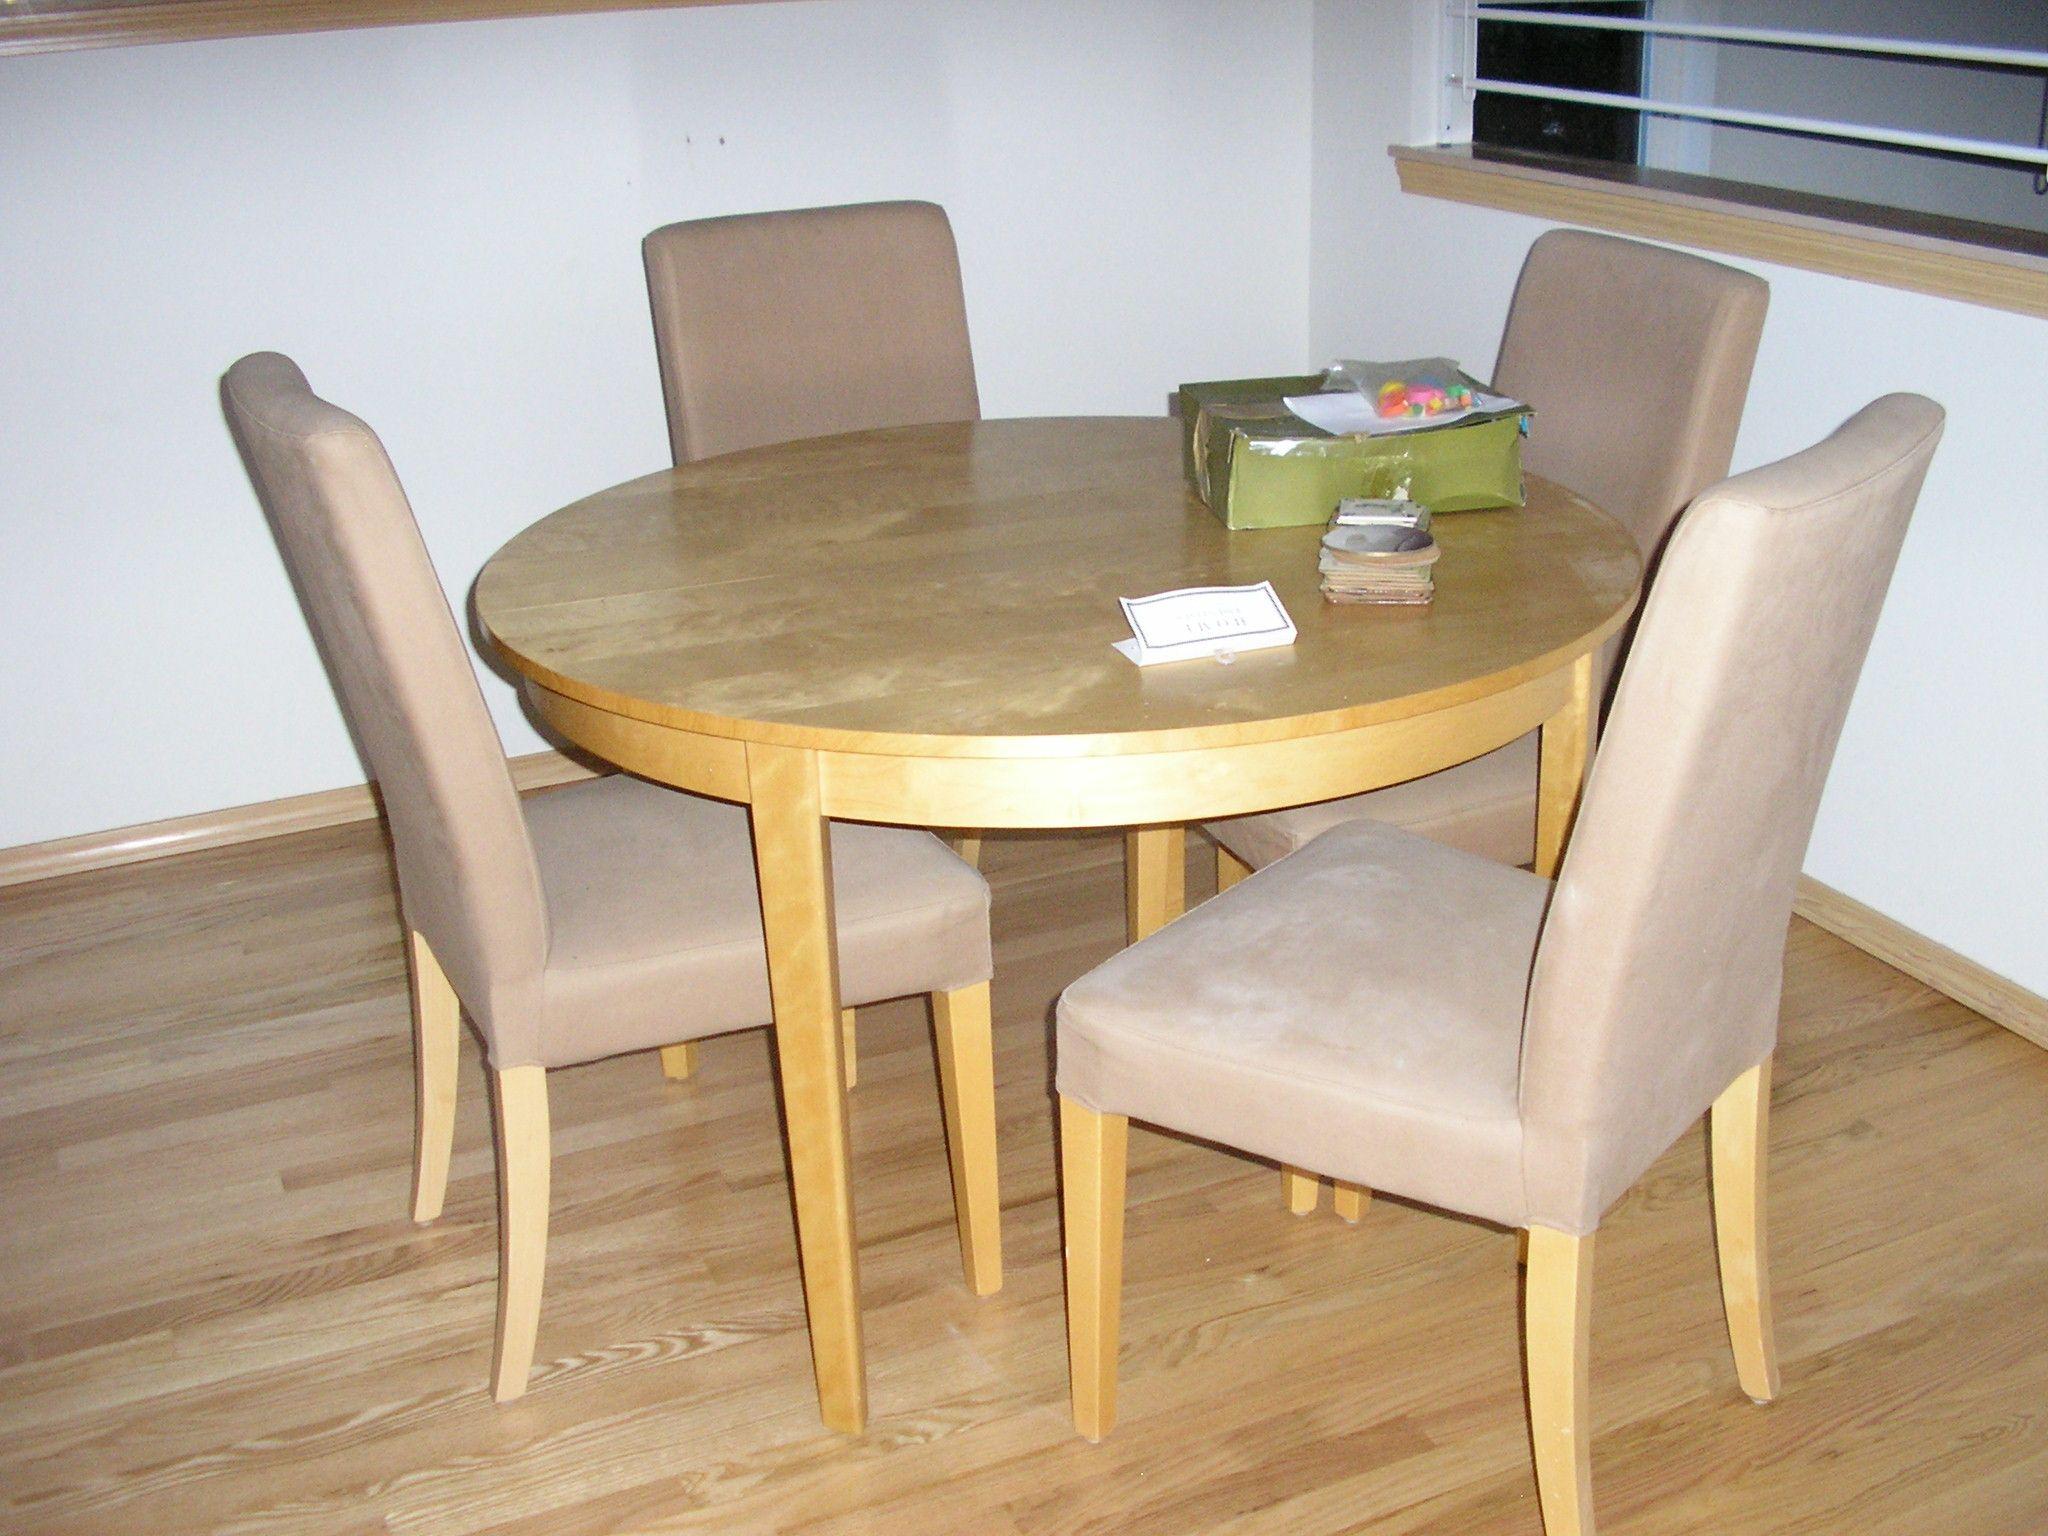 Kitchen Table With Bench And Chairs Kuche Tisch Kuchen Layouts